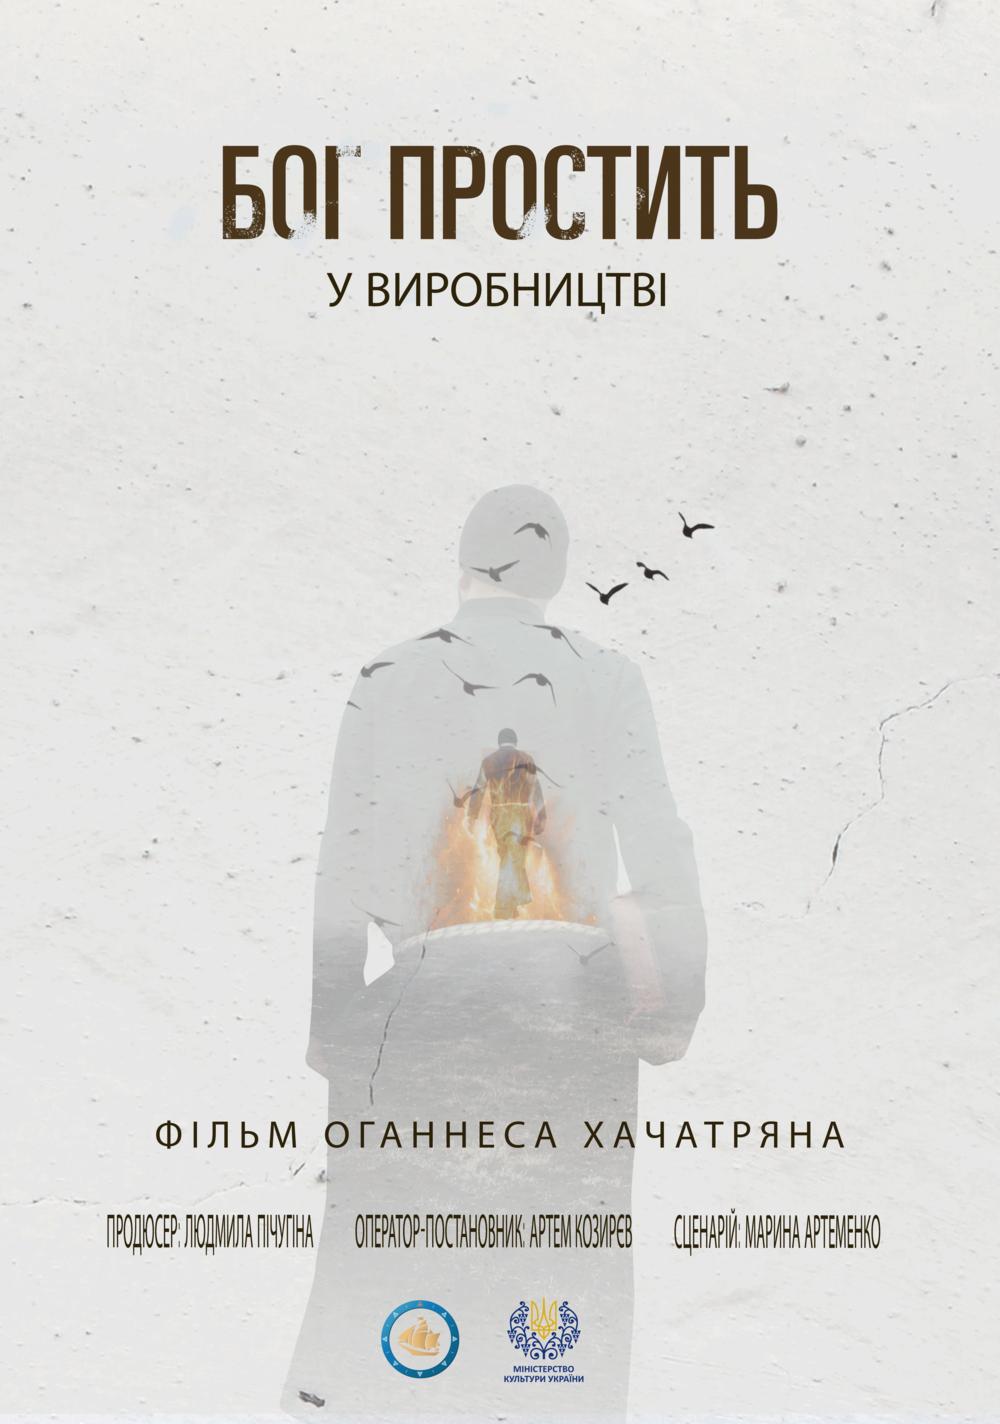 Постер до фільму «Бог простить» режисера Оганесса Хачатряна. Авторка: Анастасія Бойко